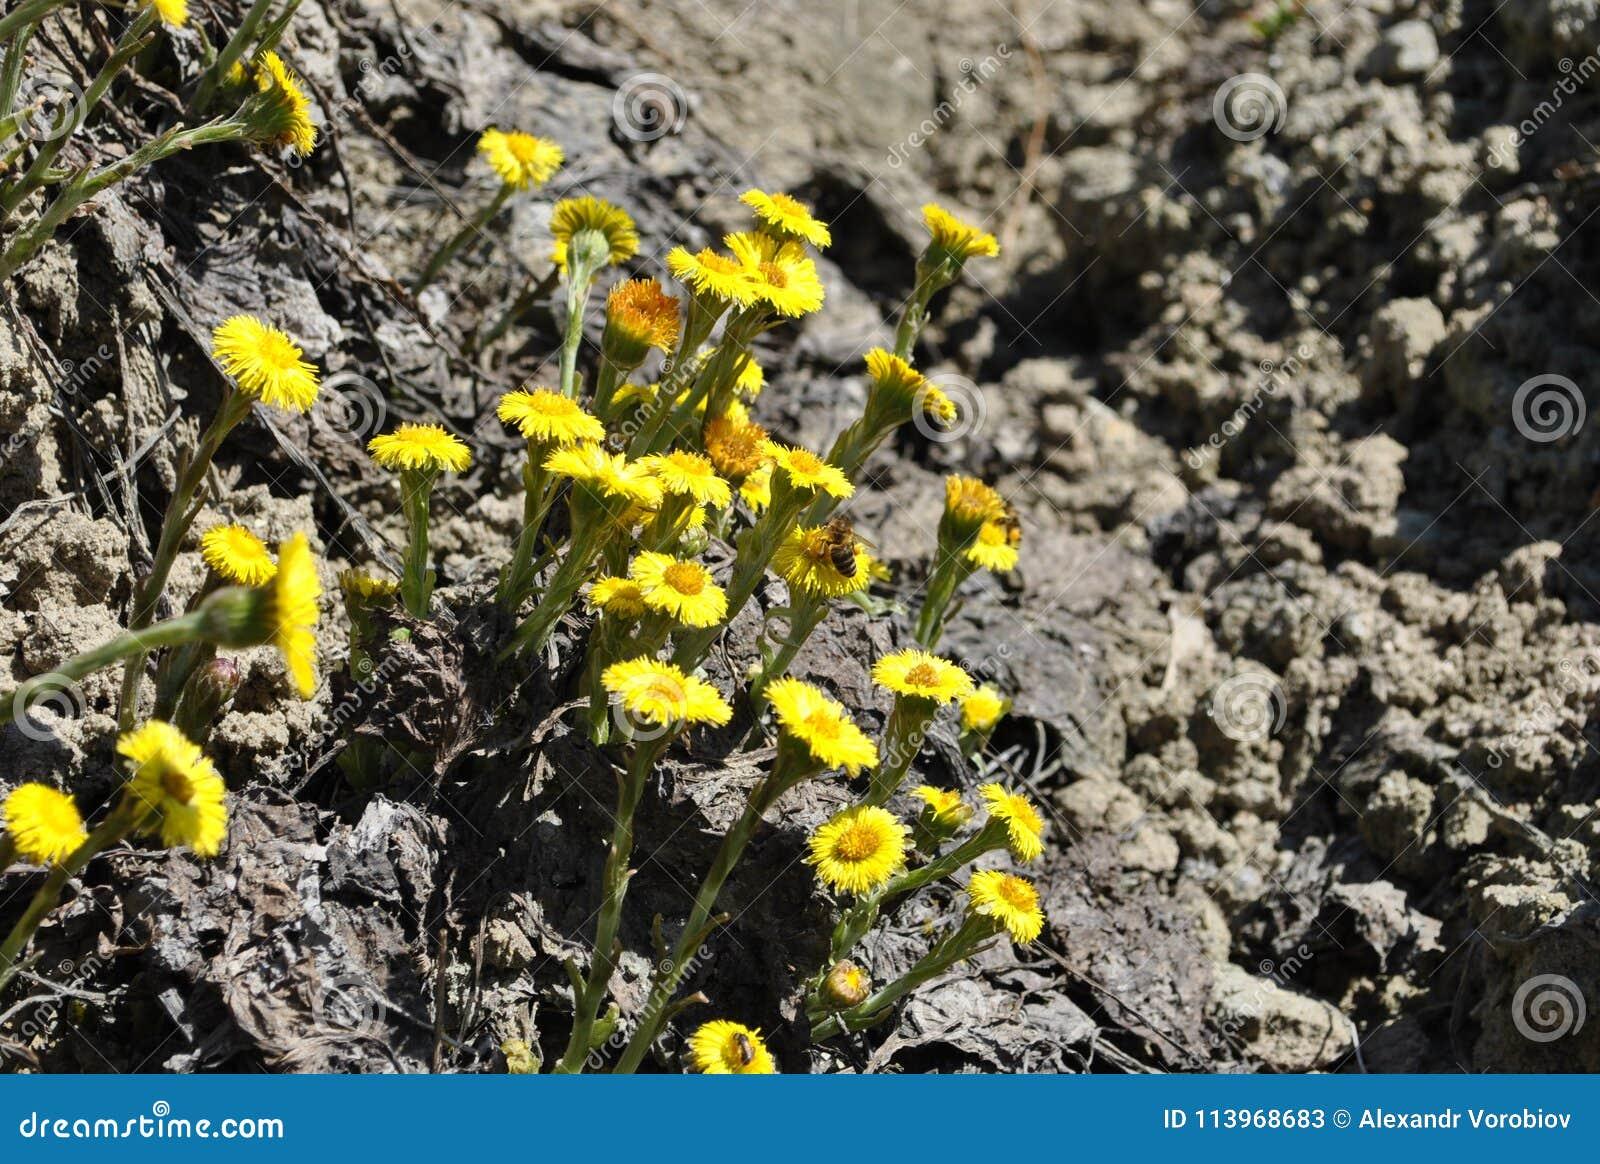 Spring Tussilgo Frfara Medicinal Plants Stock Image Image Of